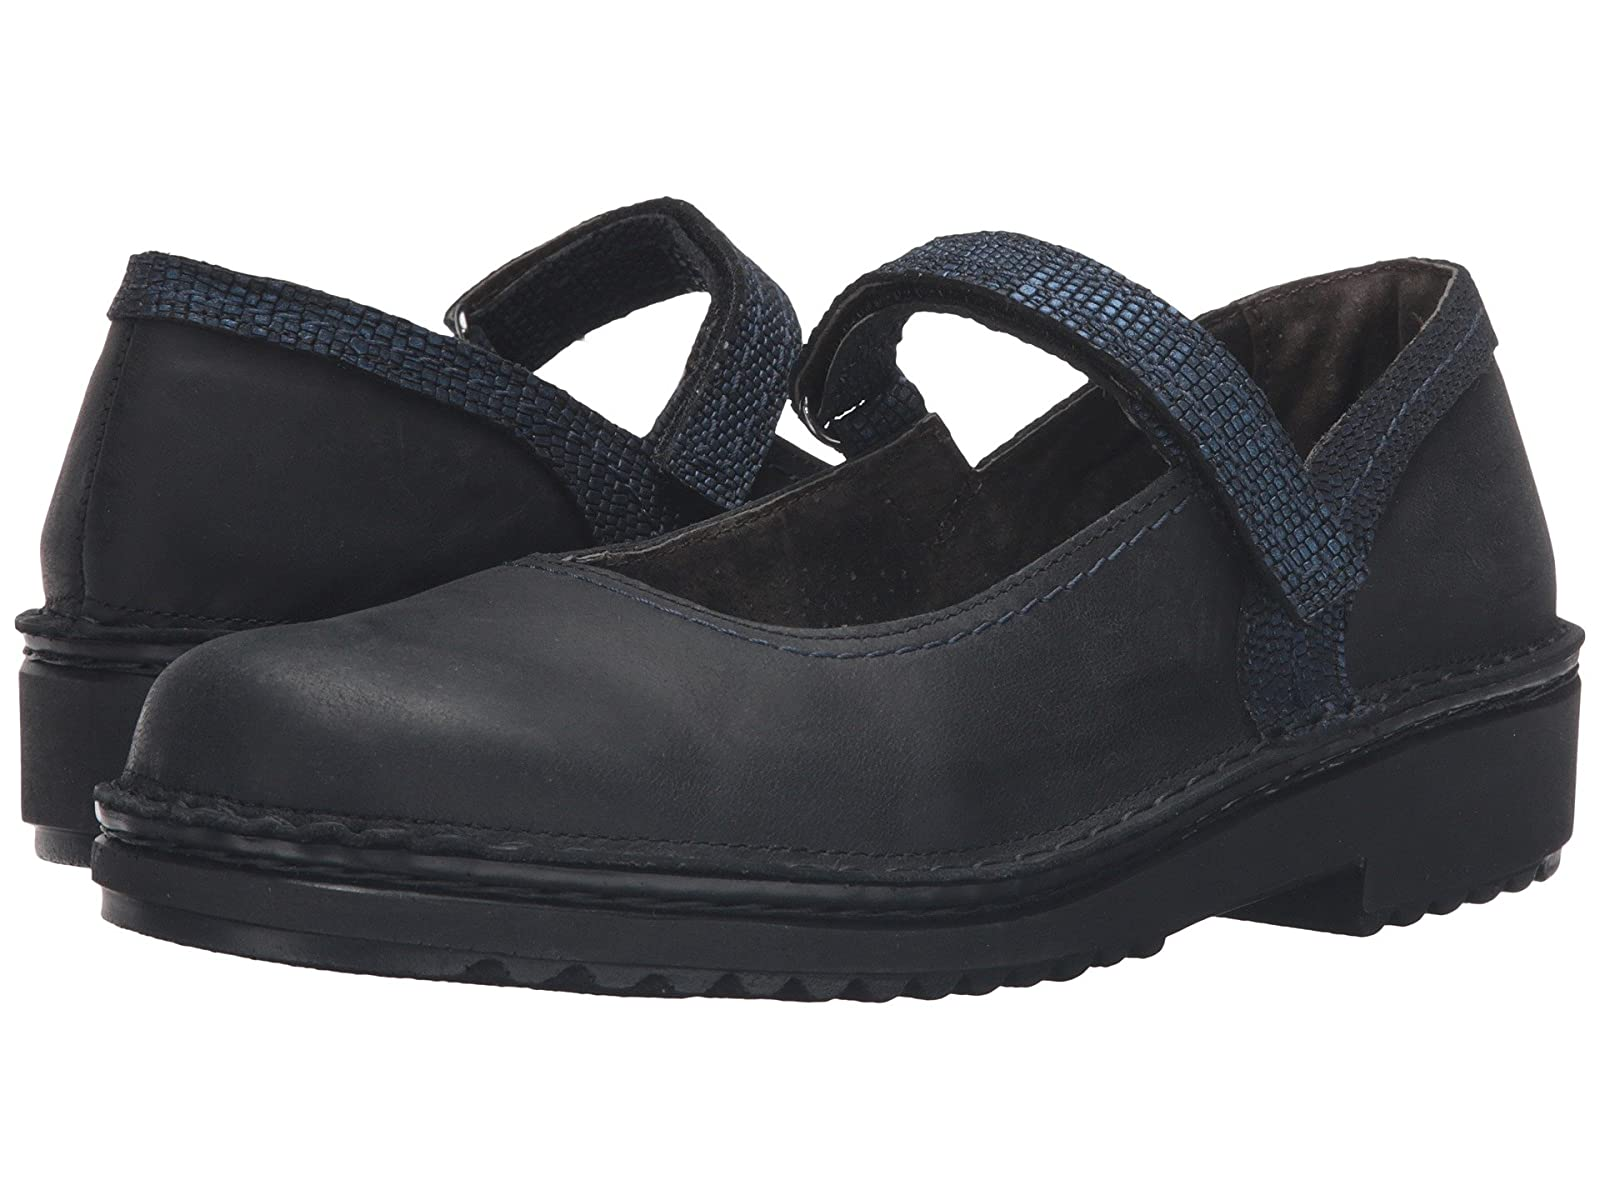 Naot HildaCheap and distinctive eye-catching shoes